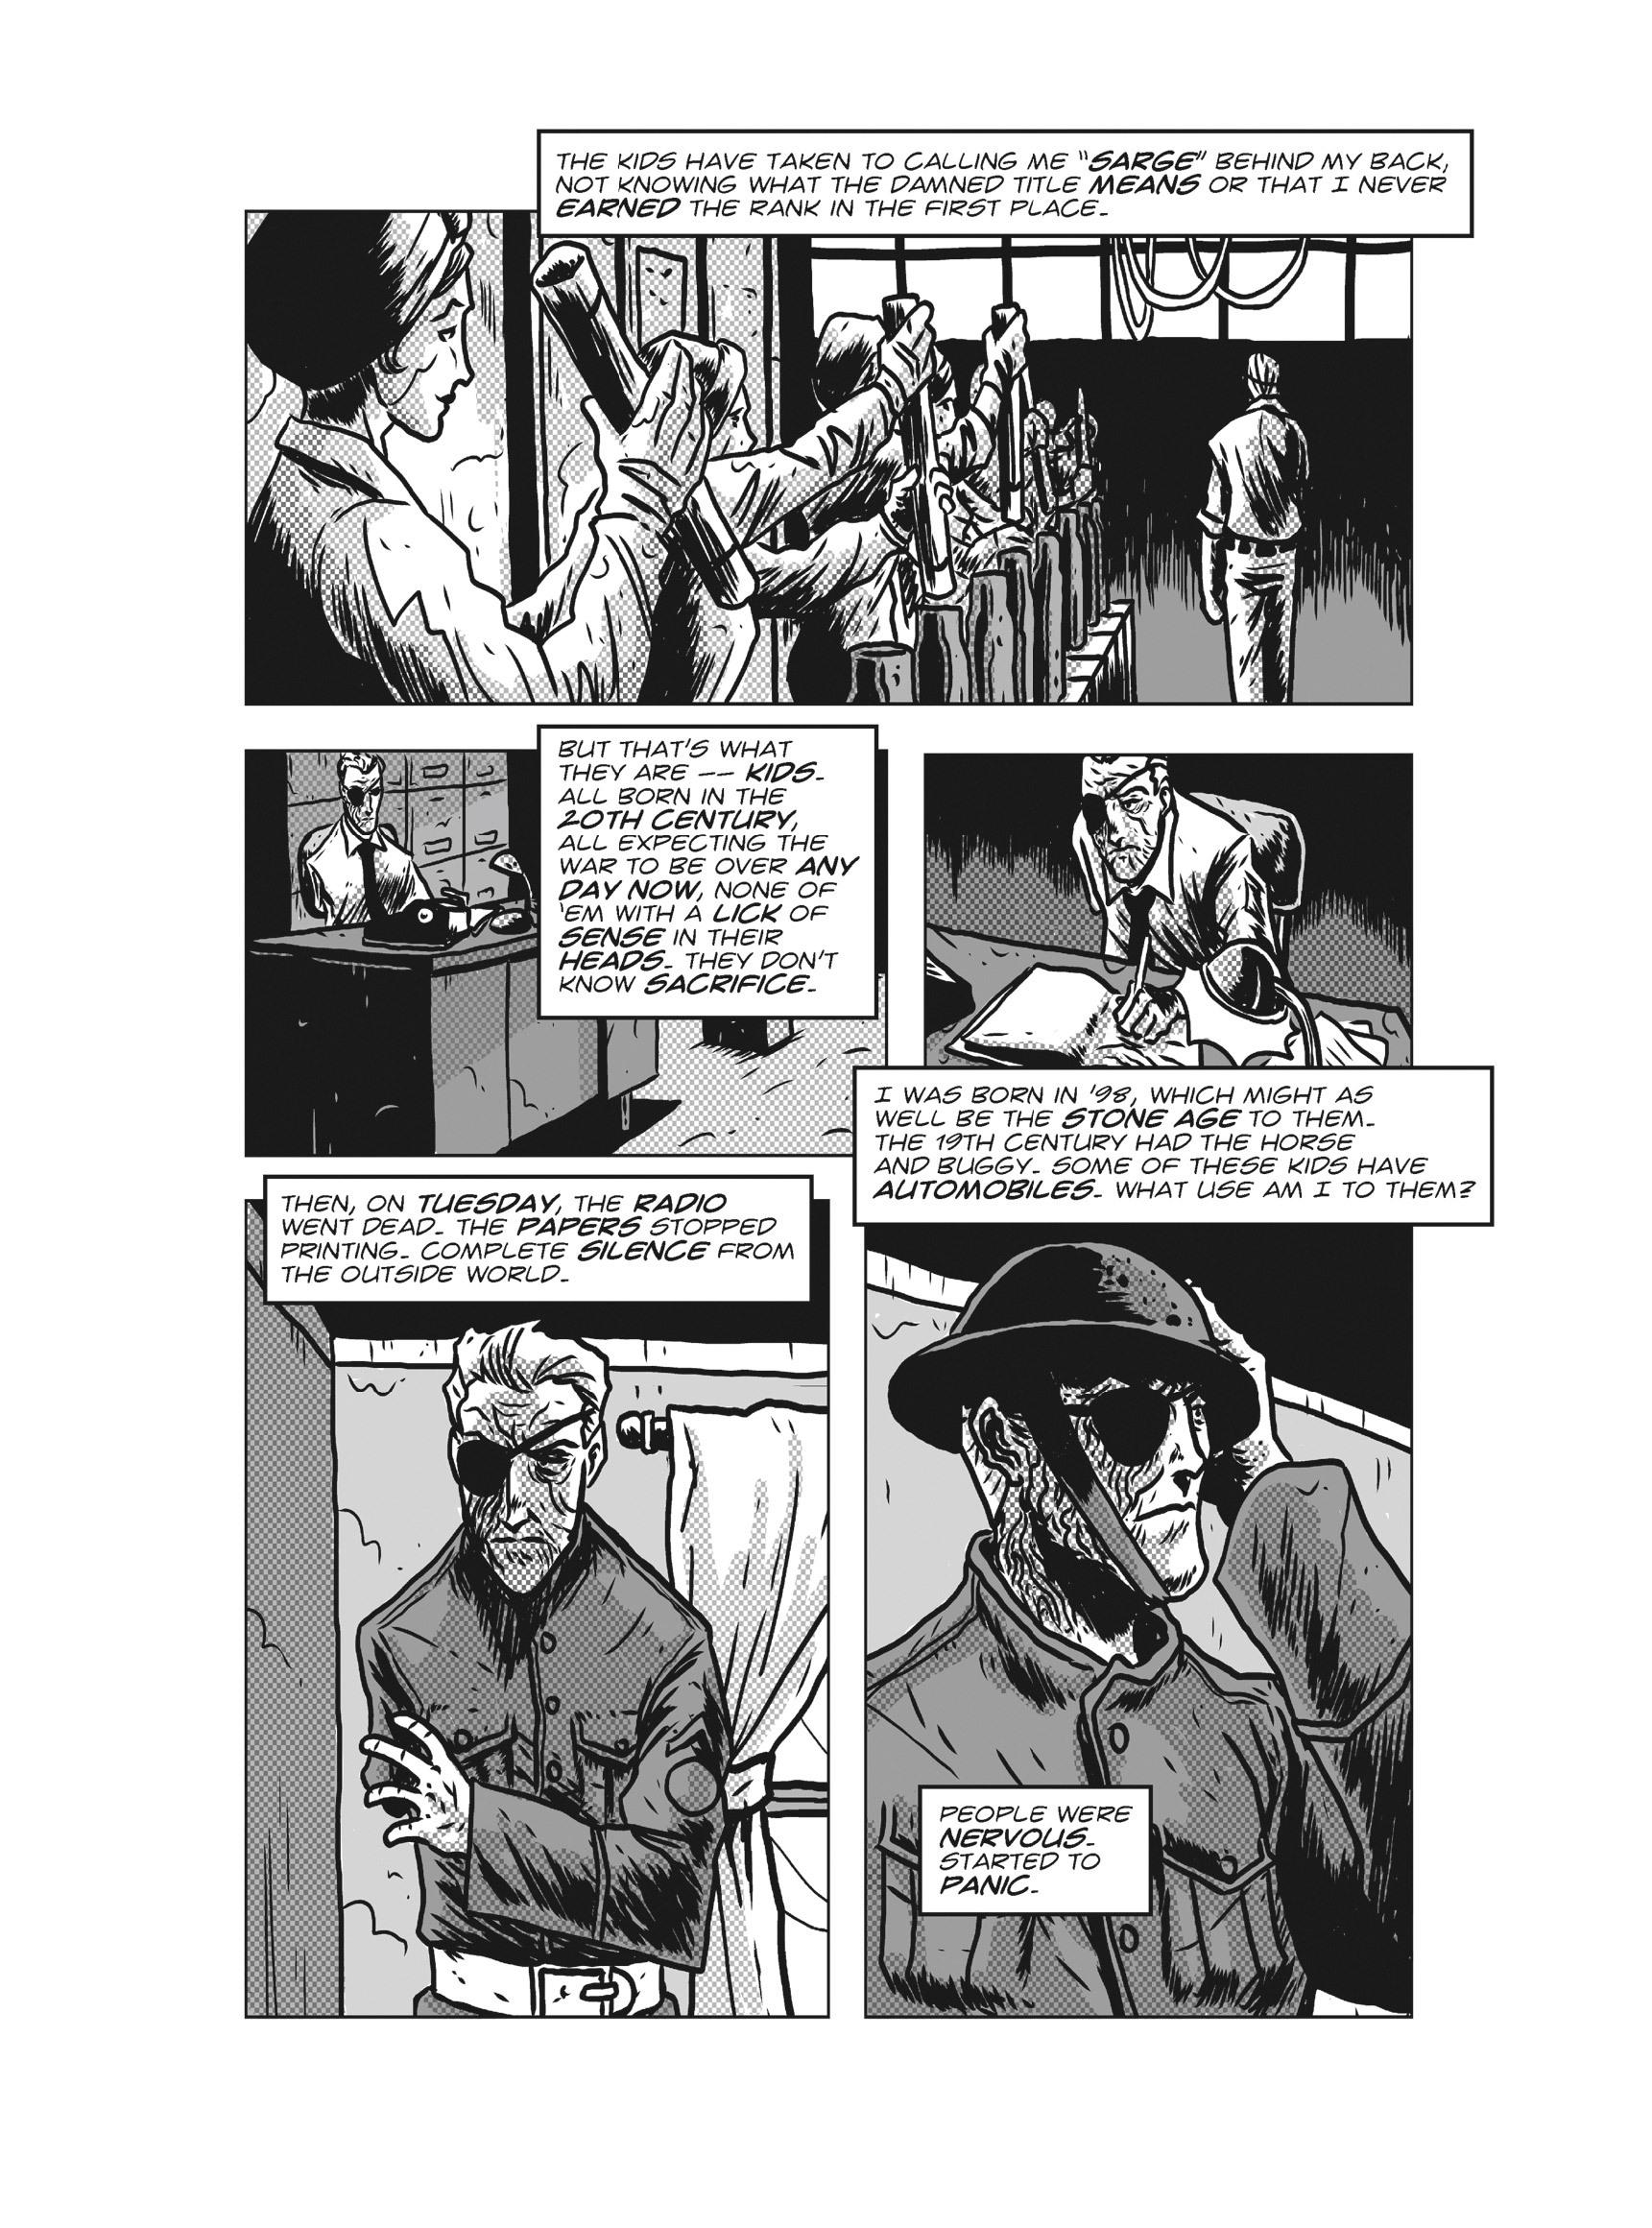 Read online FUBAR comic -  Issue #3 - 263